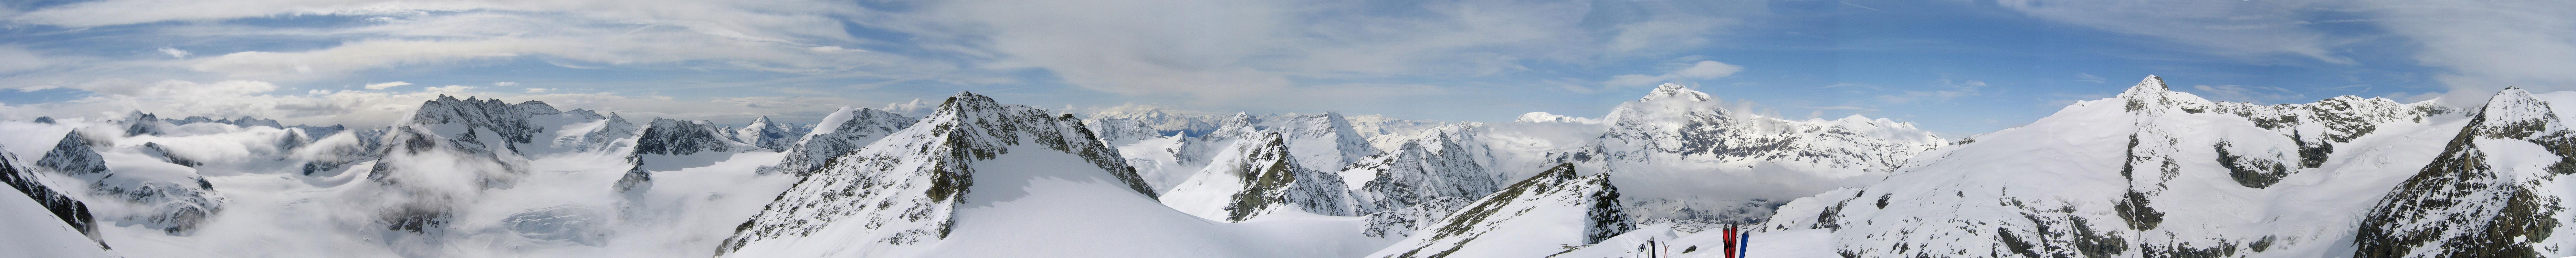 Pigne Arolla, Day 5 H.R. Chamonix-Zermatt Walliser Alpen / Alpes valaisannes Švýcarsko panorama 52